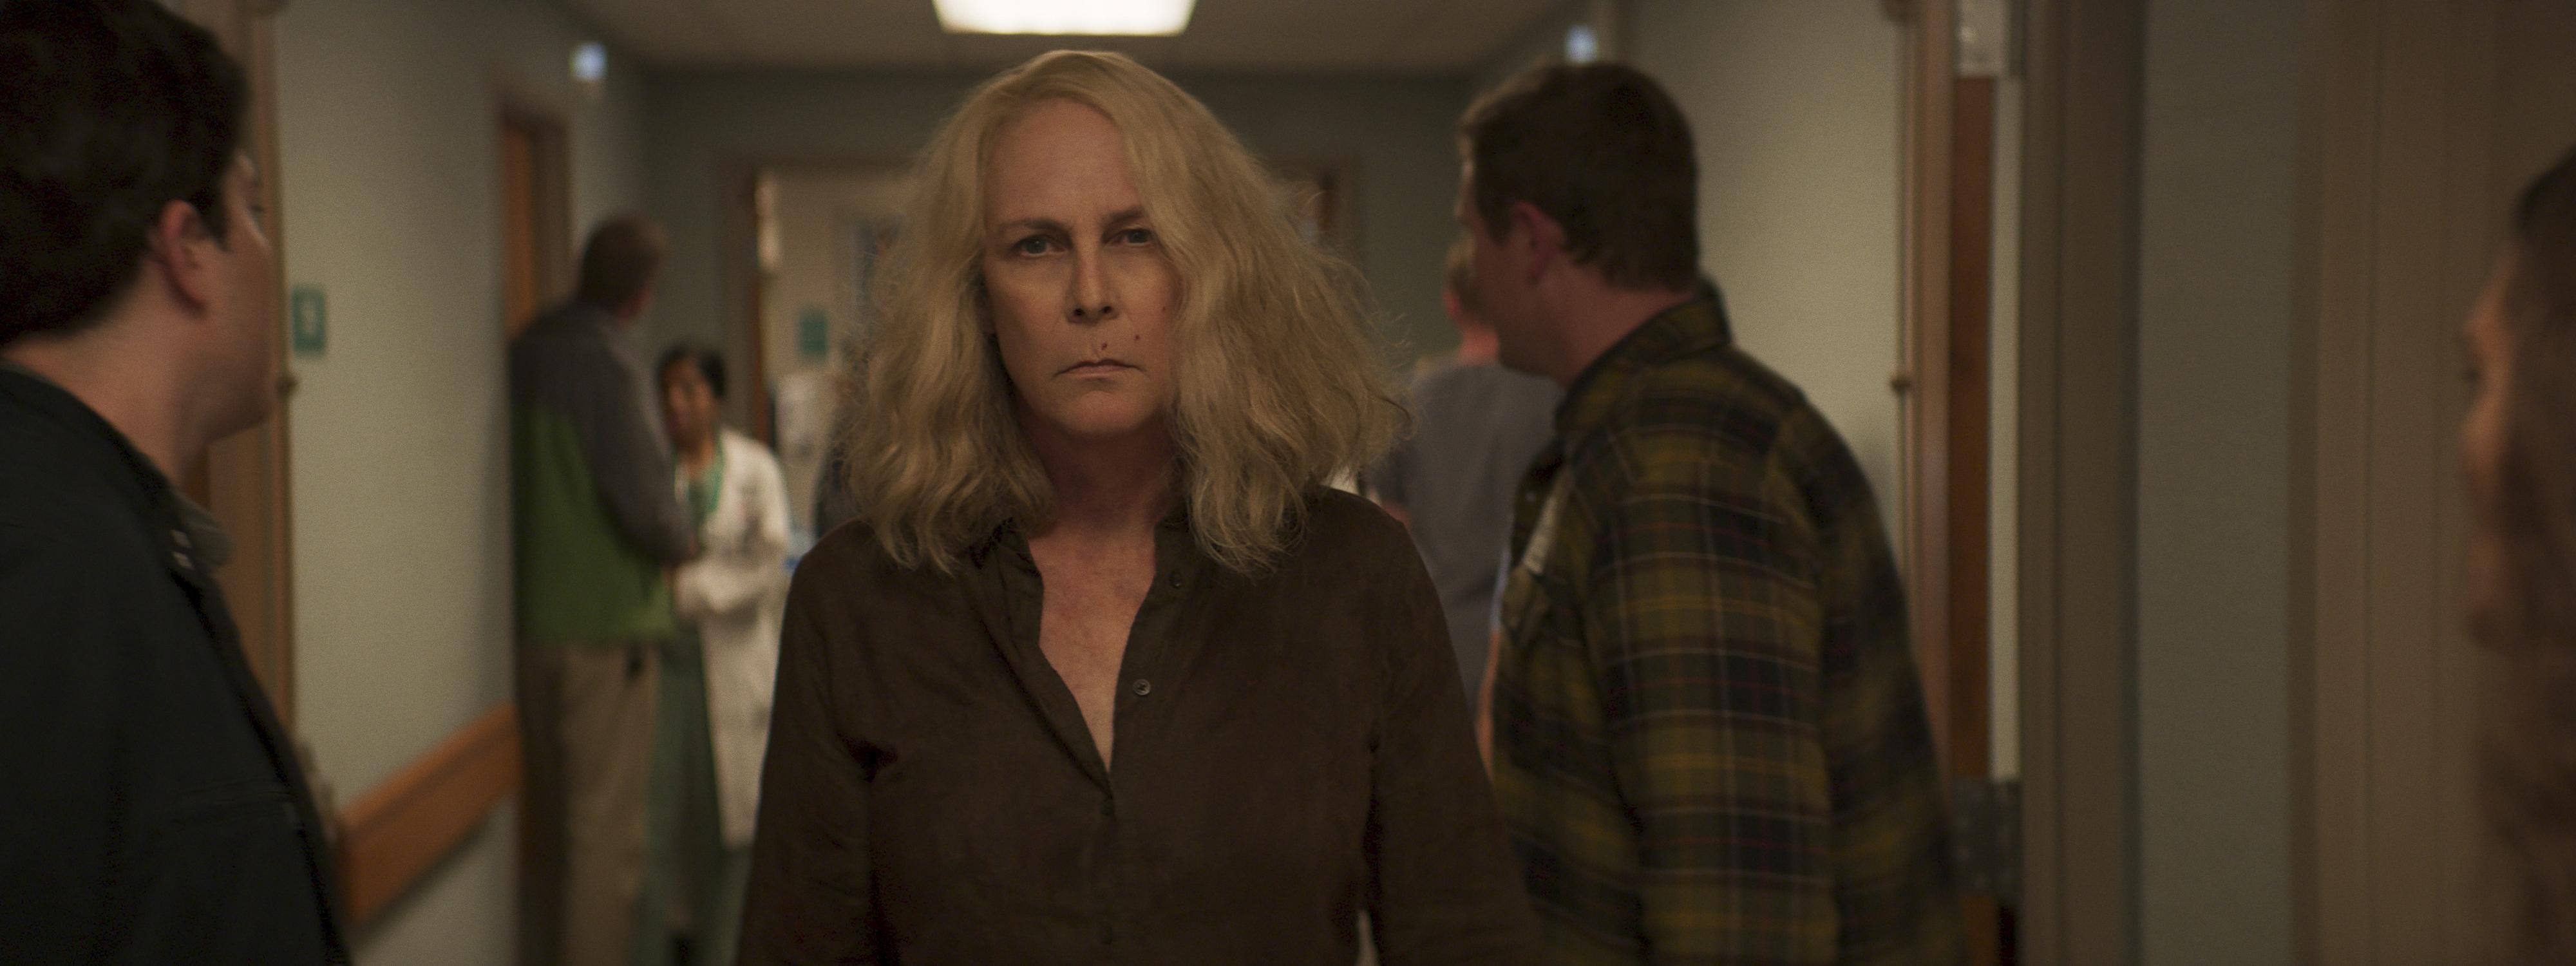 Laurie Strode (Jamie Lee Curtis) - Halloween Kills